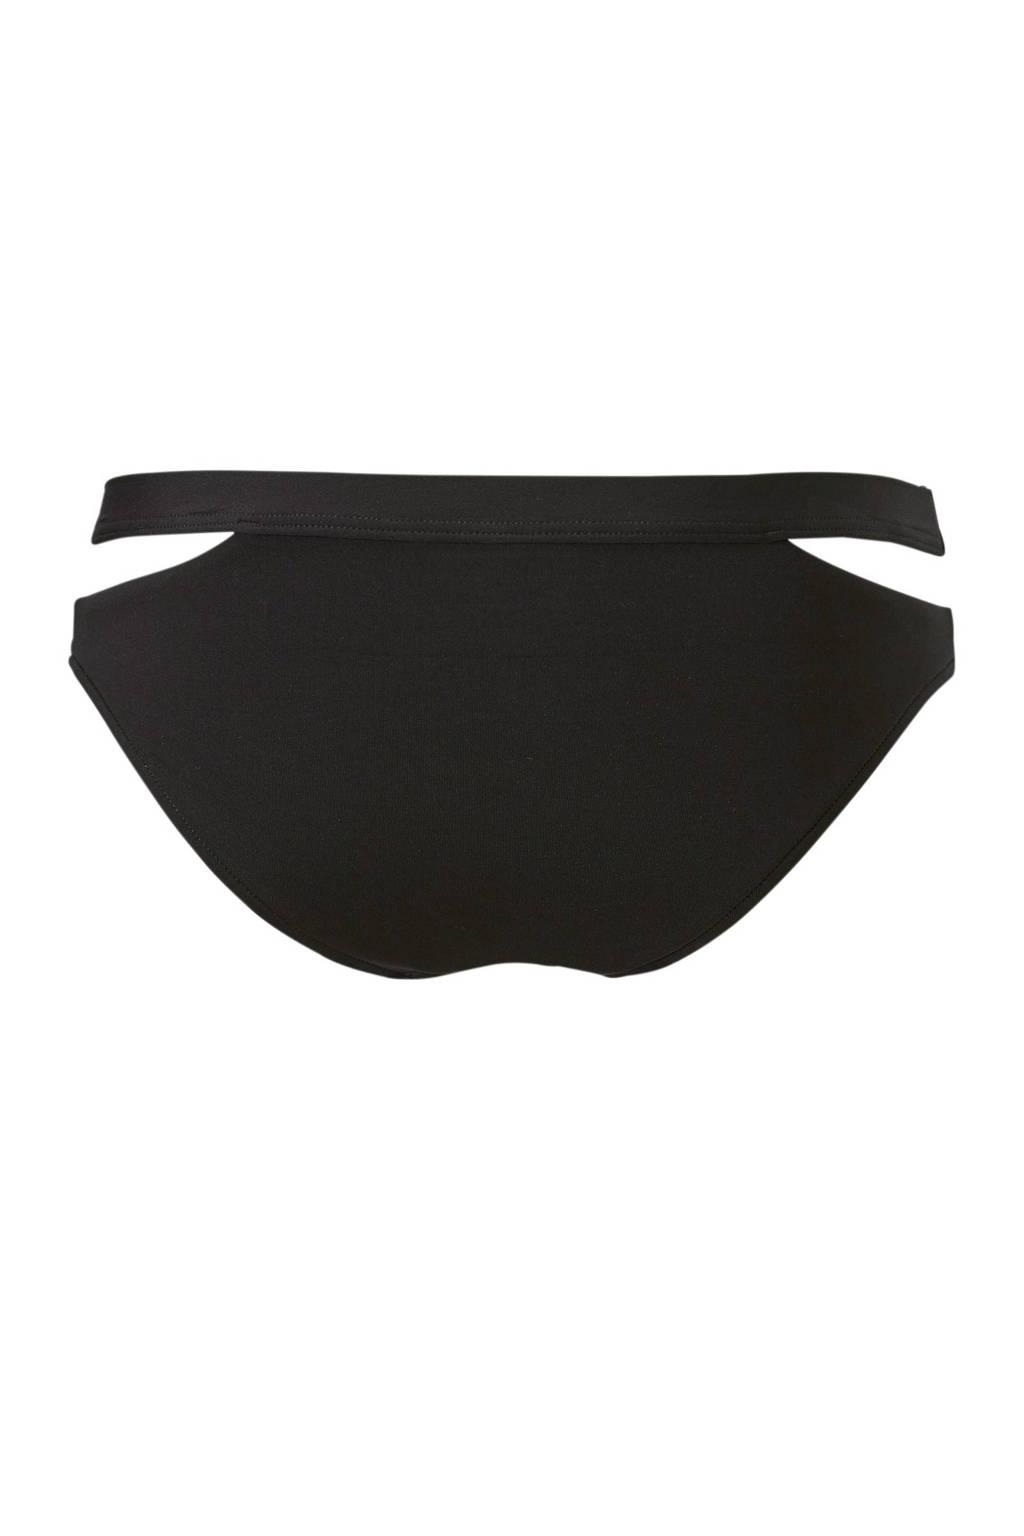 Seafolly Mix & Match bikinibroekje, Zwart